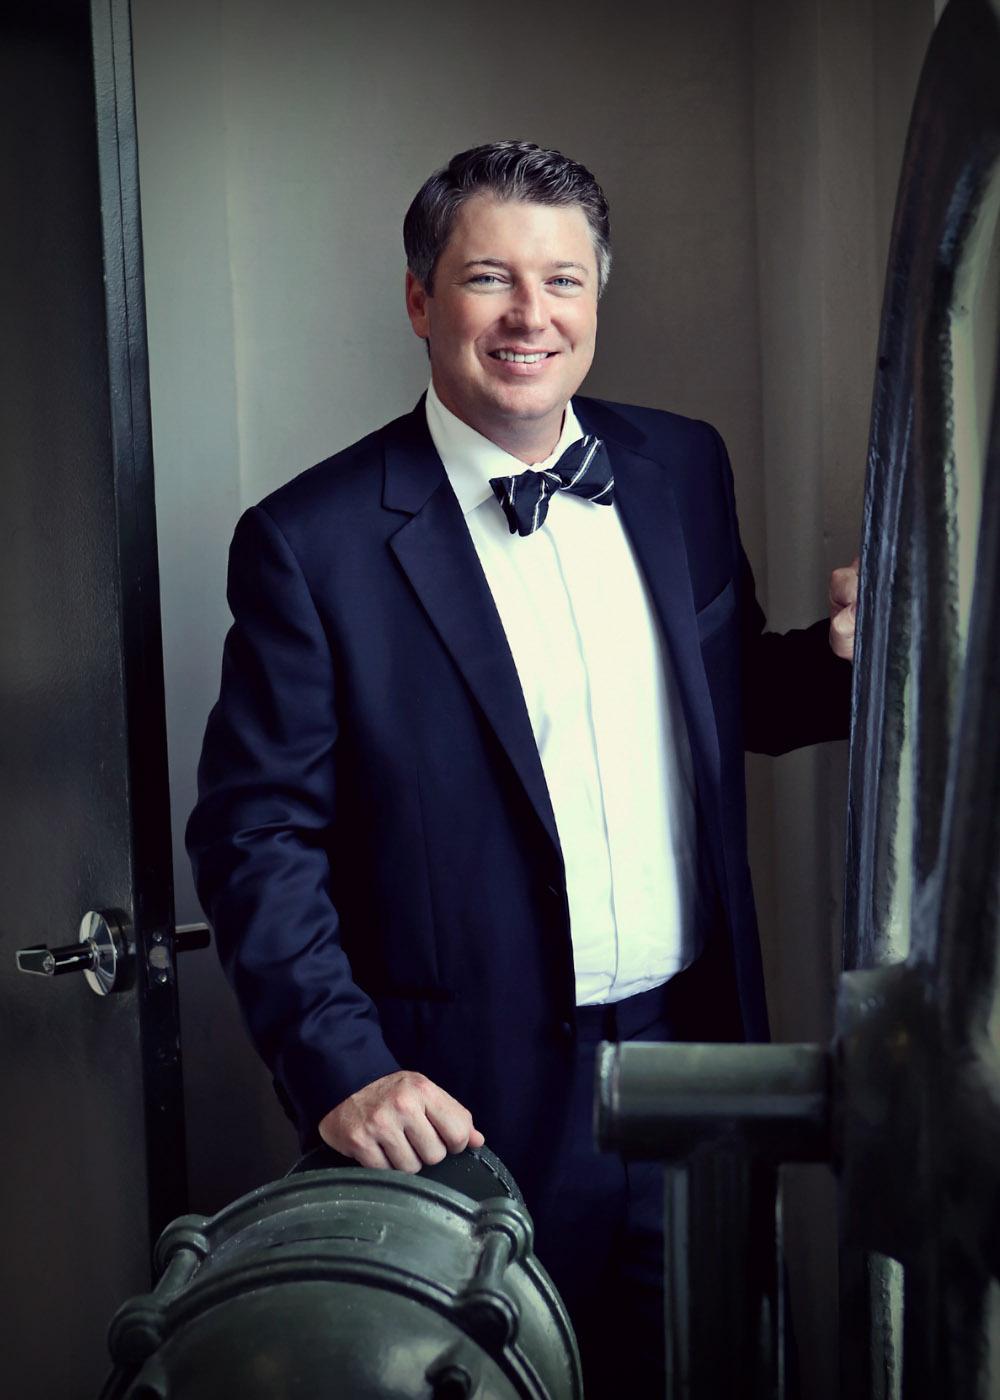 A groom has his portrait shot.